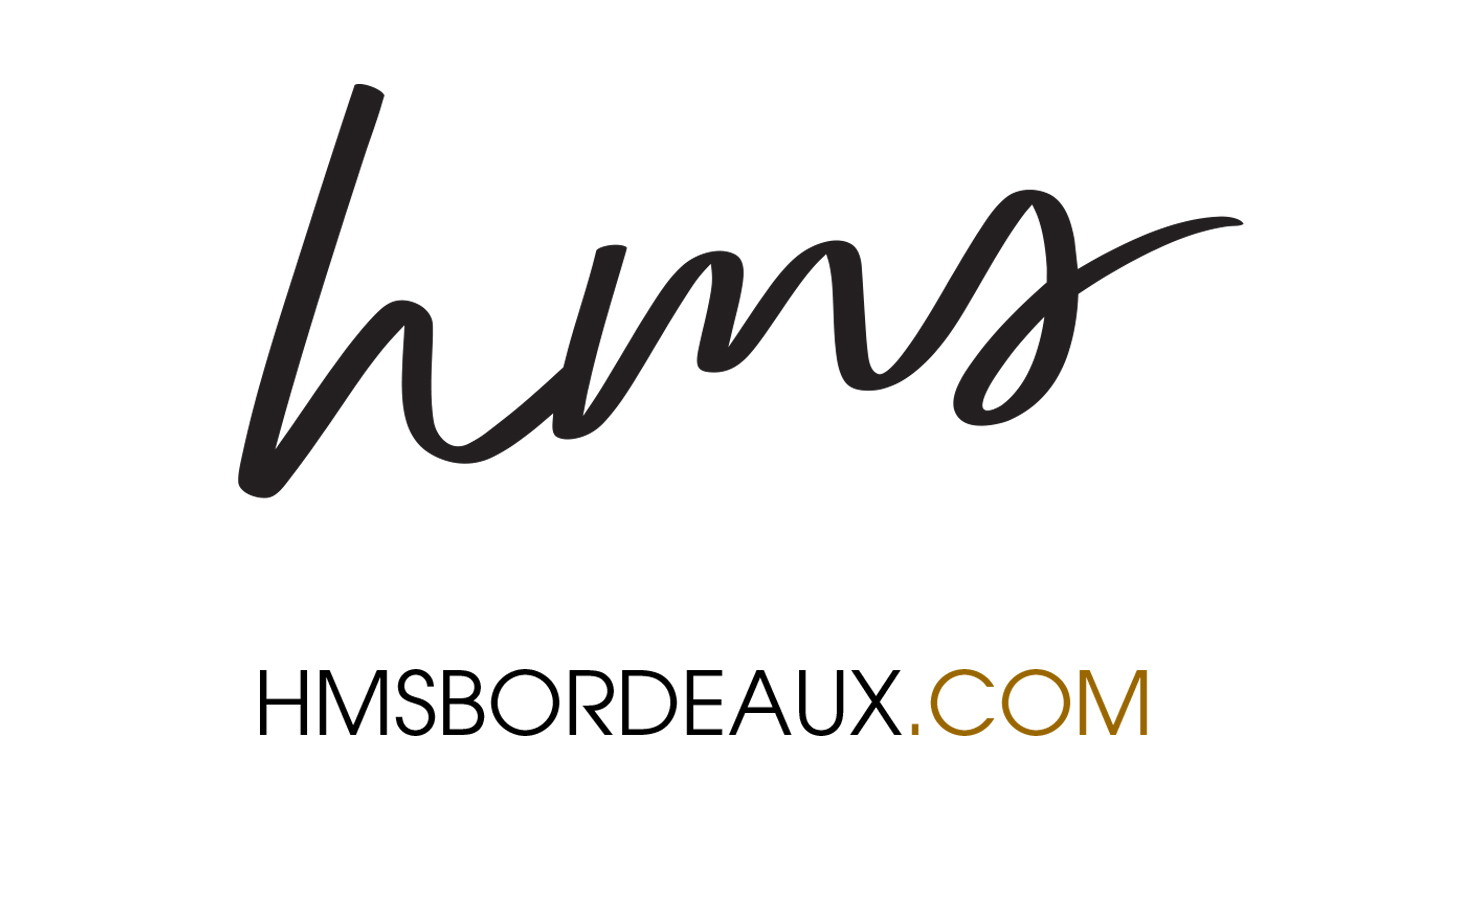 HMS Haut Medoc Selection logo